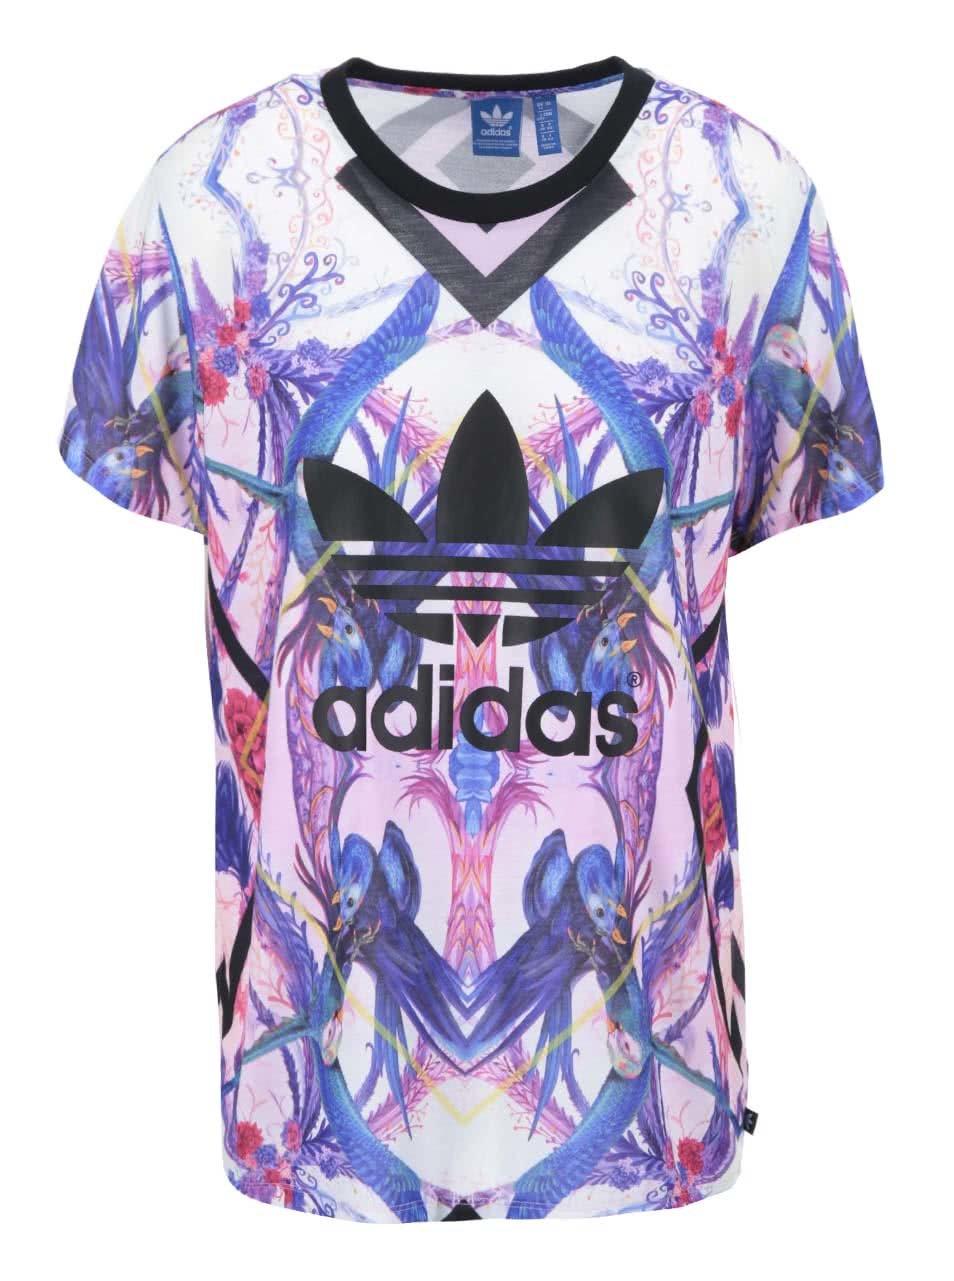 Barevné dámské vzorované triko adidas Originals Florera ... b44dedb2b39